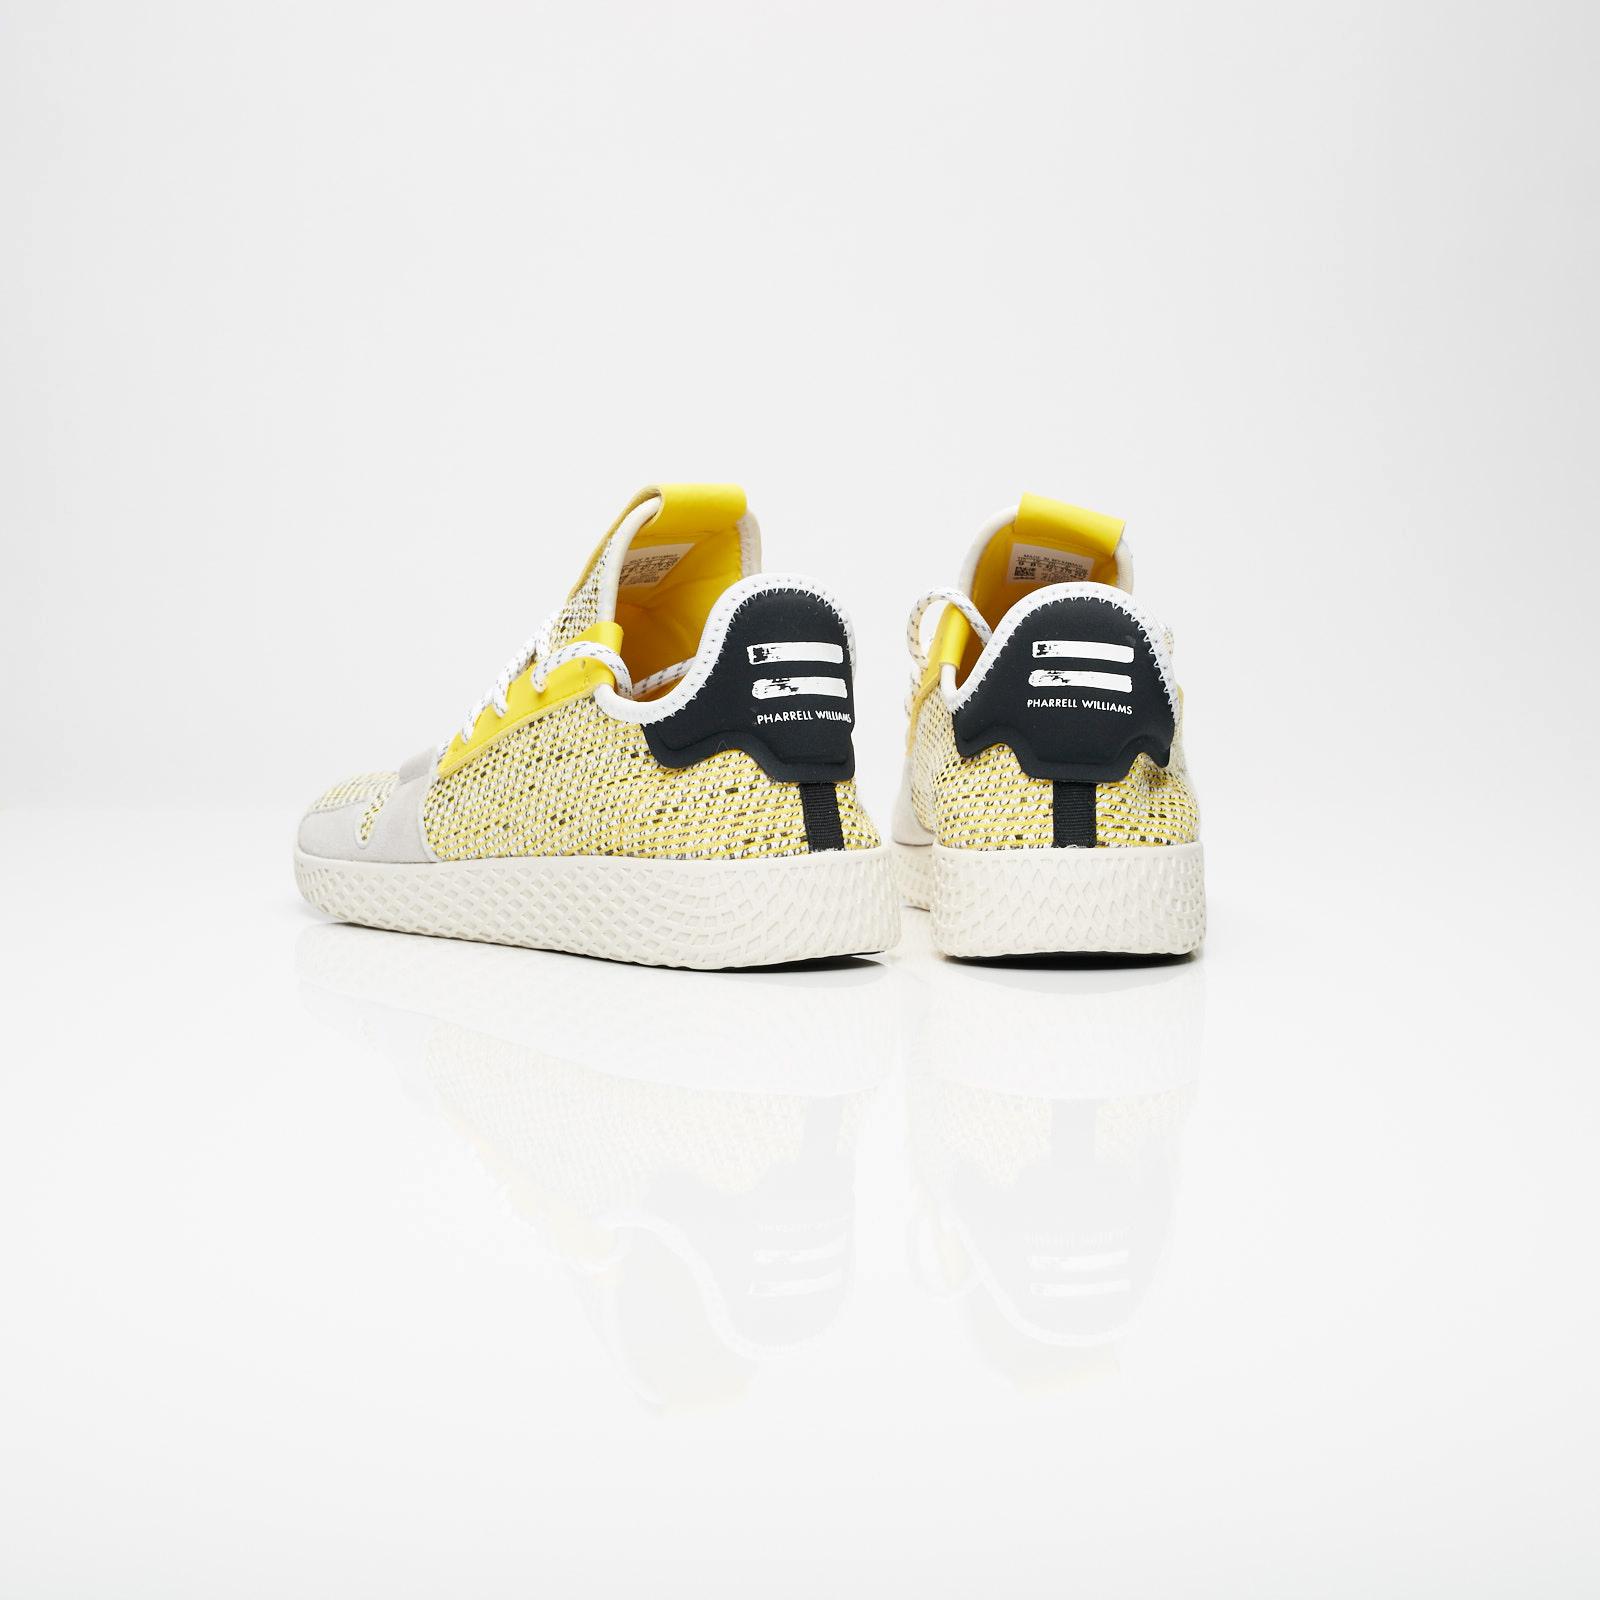 aeeecc014 adidas Solar Tennis HU V2 x Pharrell Williams - Bb9543 - Sneakersnstuff